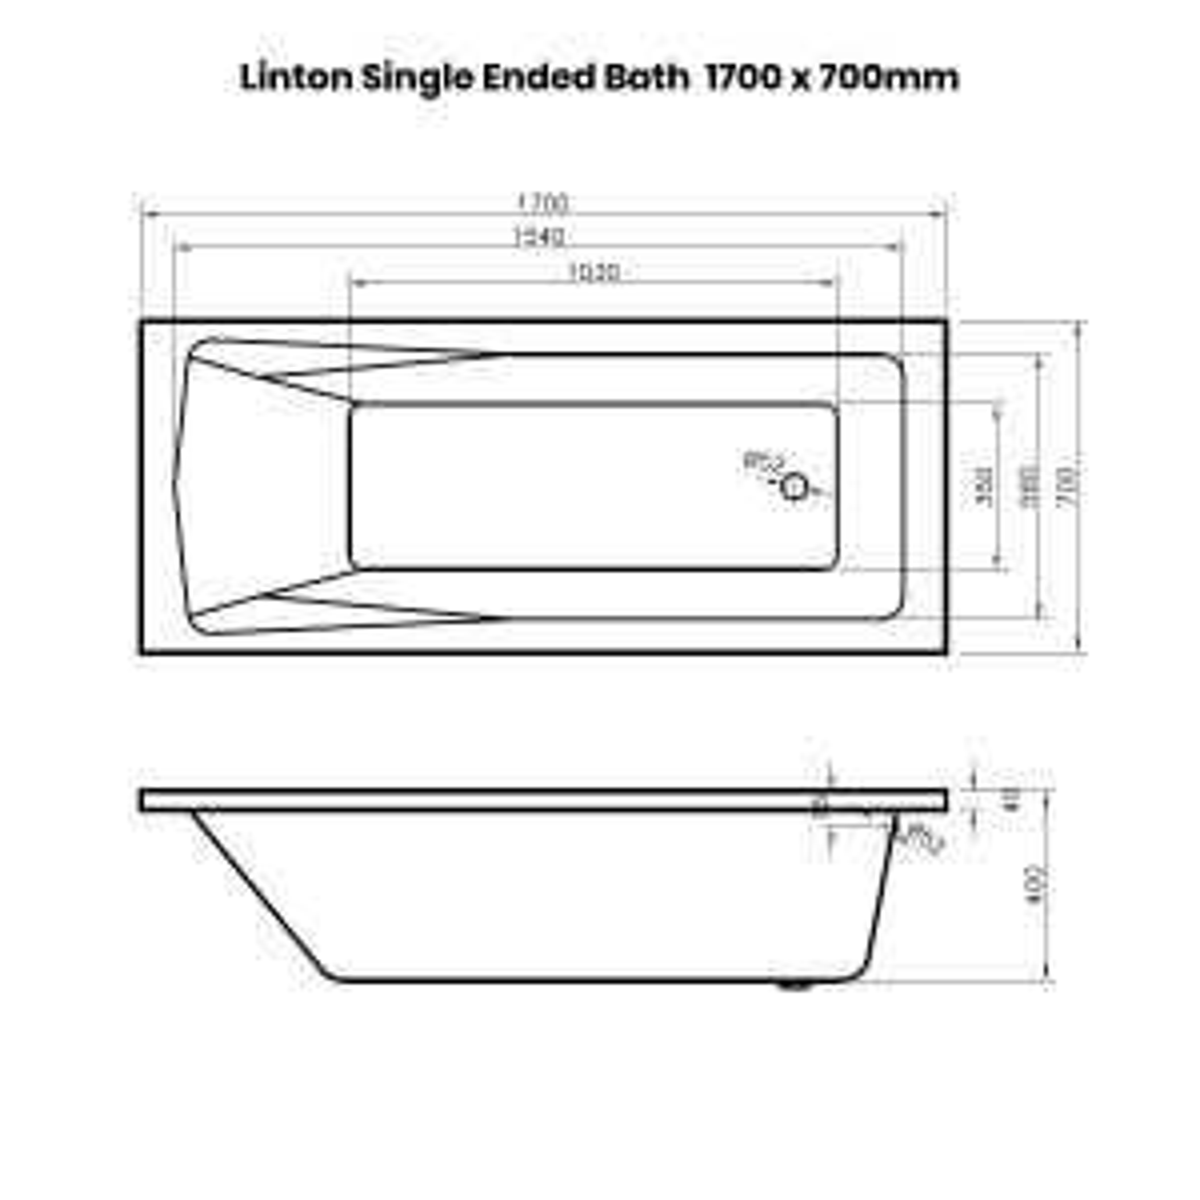 Nuie Linton Straight Shower Bath 1700 x 700mm Dimensions